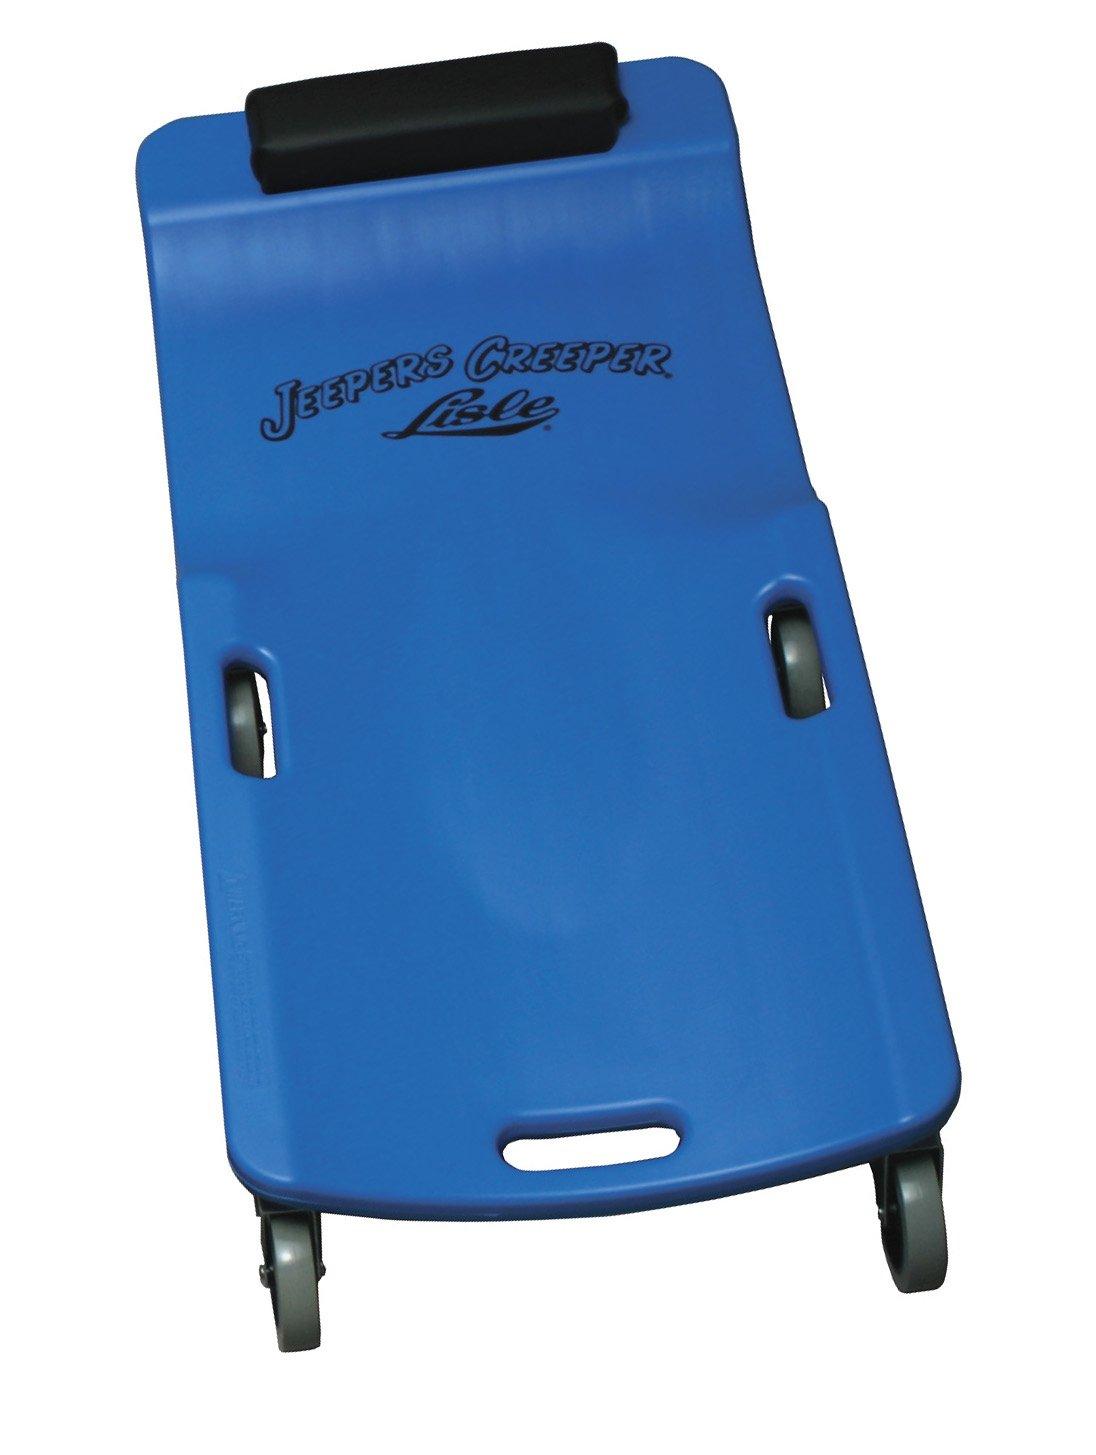 Lisle 94032 Blue Large Wheel Creeper by Lisle